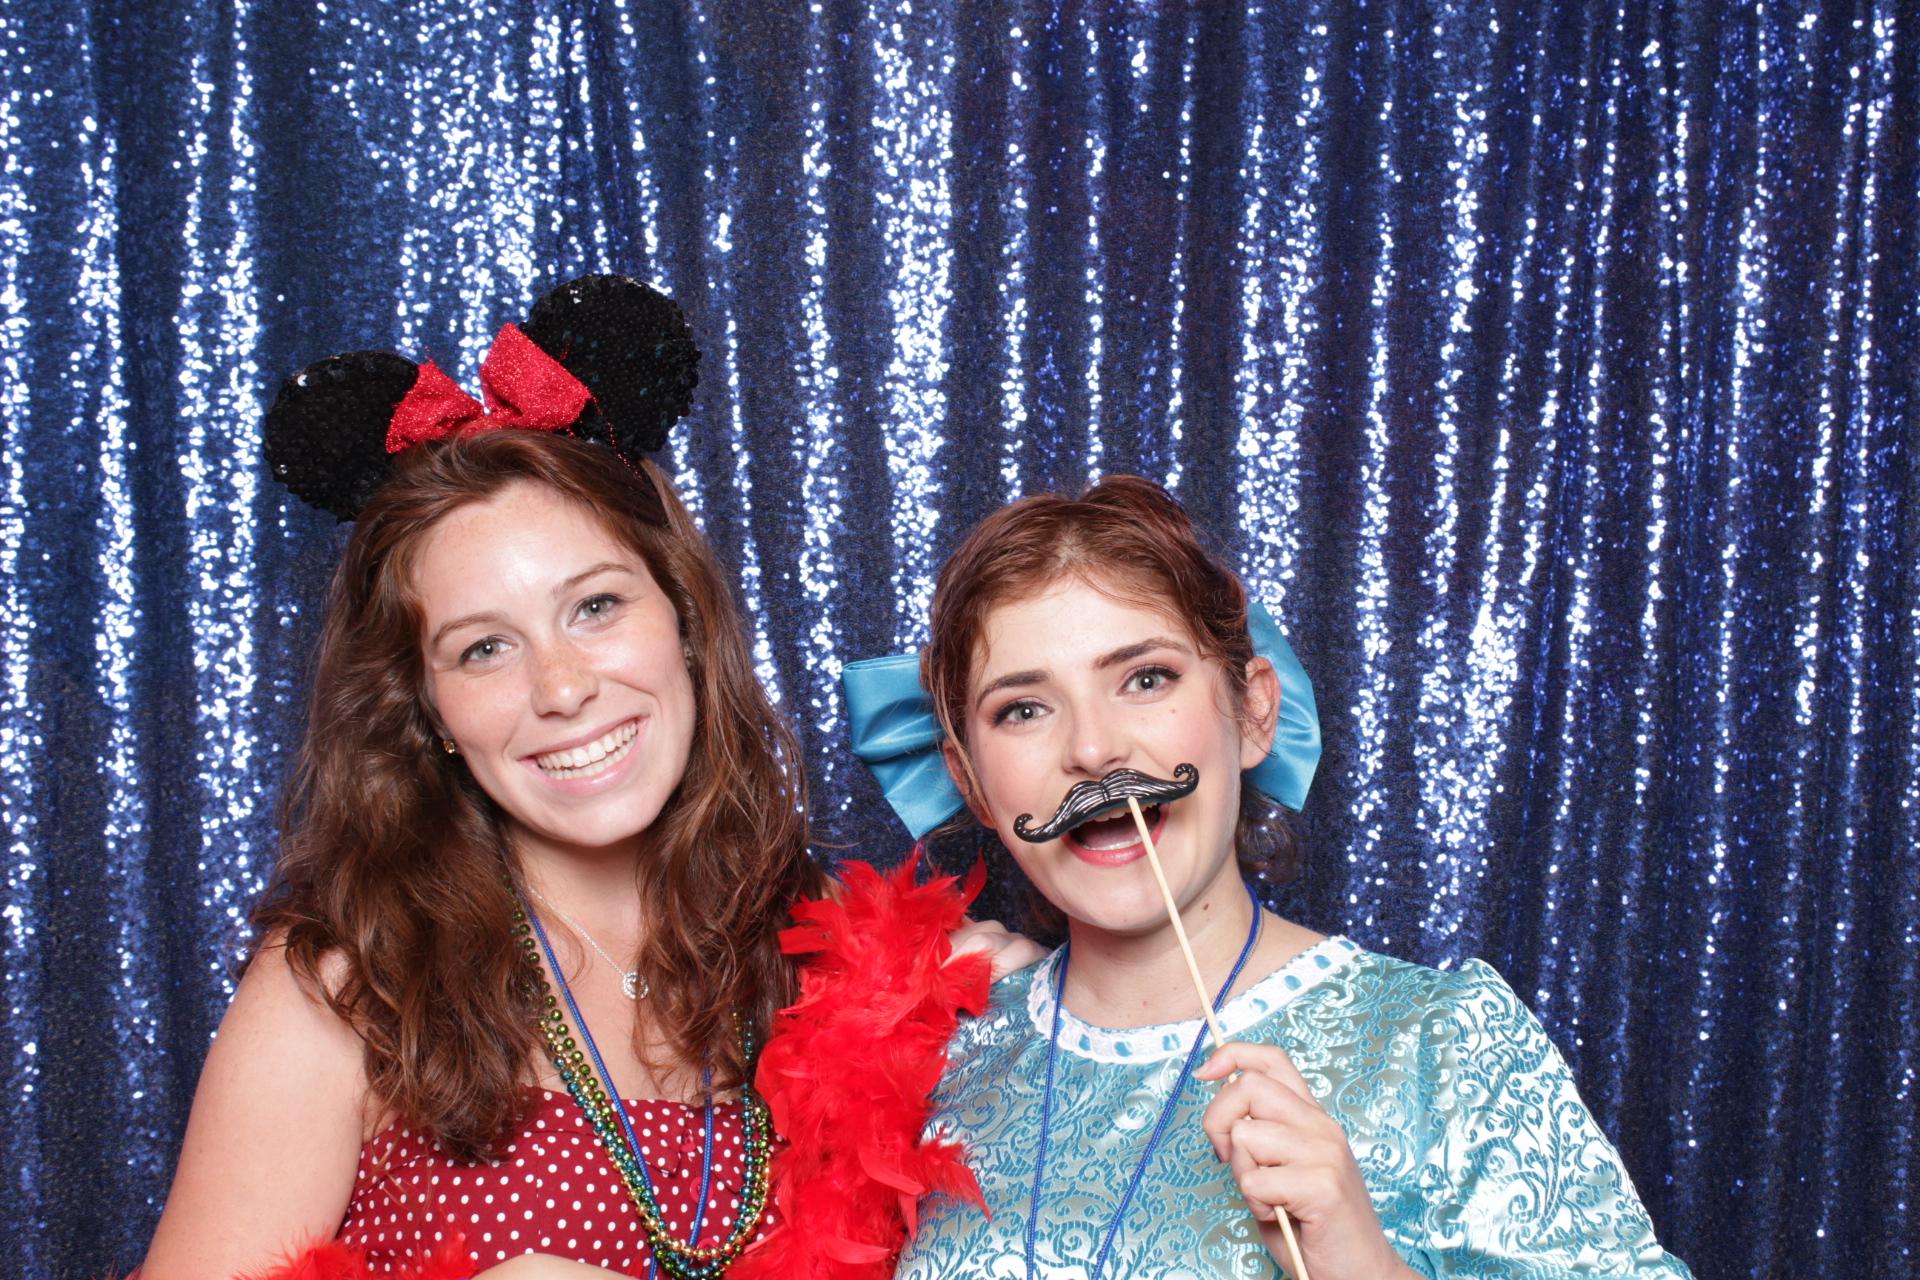 Miami, Ft. Laduerdale, Sarasota College Photo Booth Fun